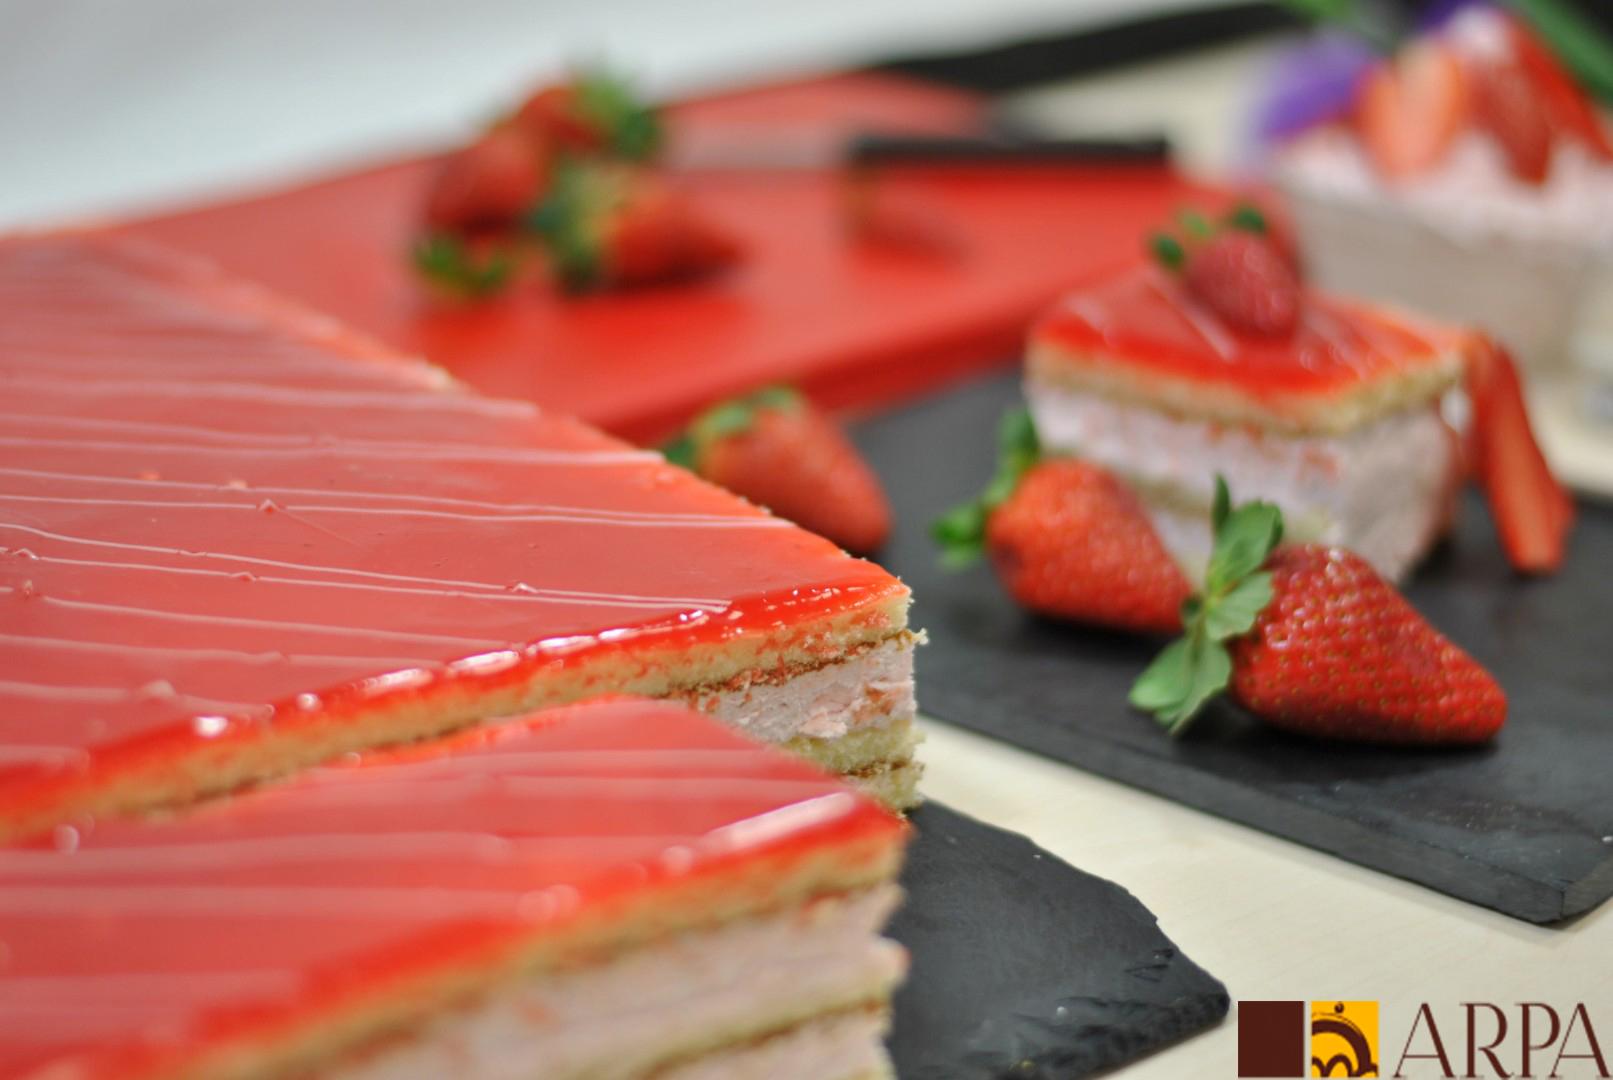 Pastel rectangular relleno de nata saborizada de fresa y recubierto de mermelada de fresa.